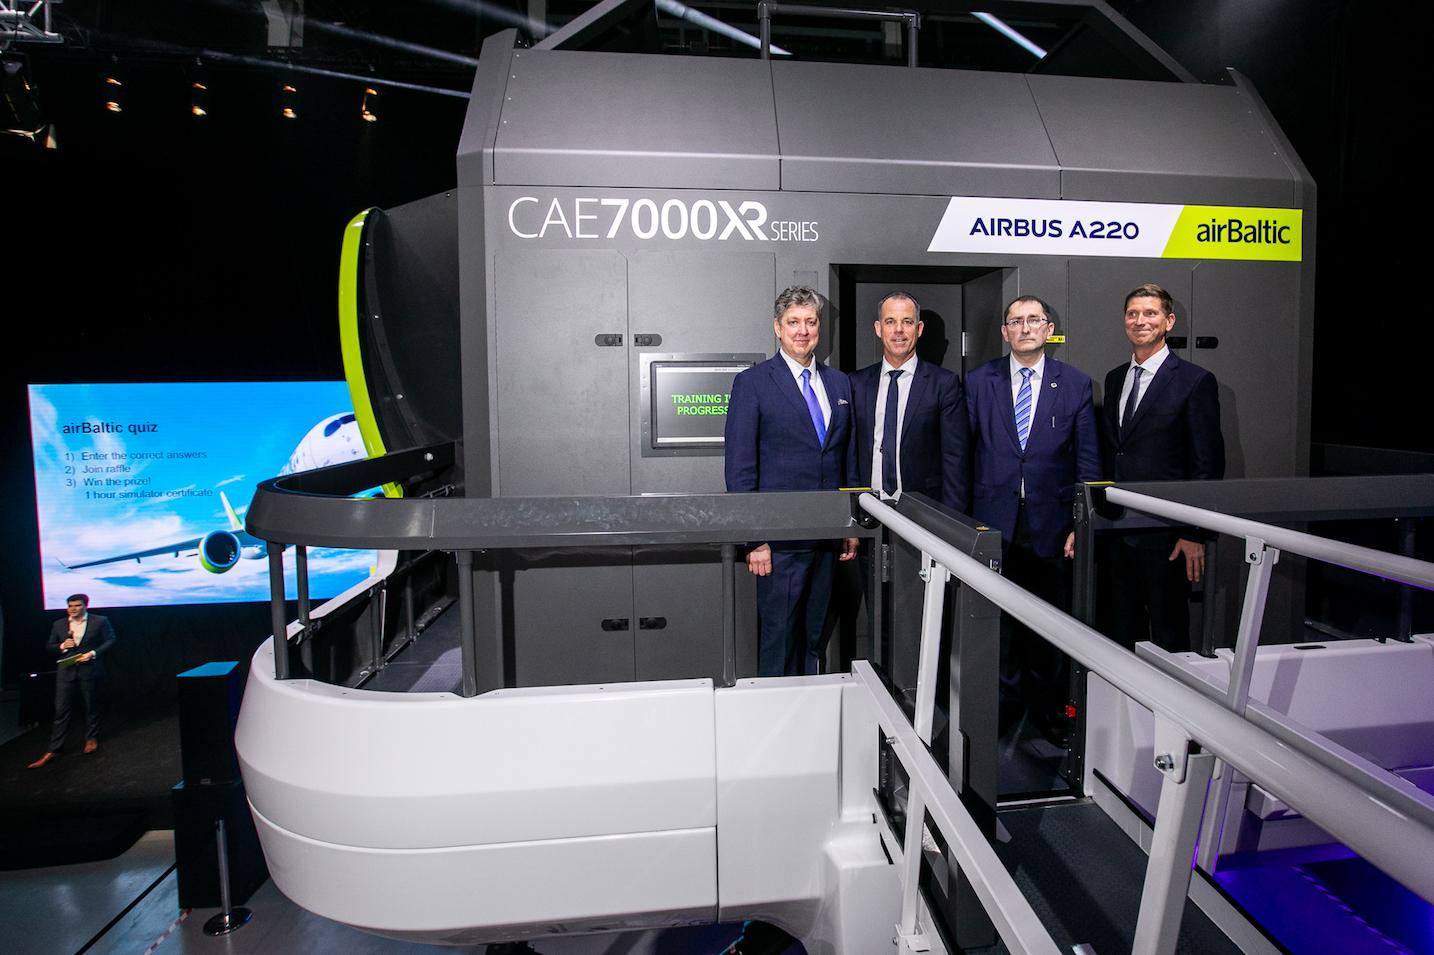 2019_12_3_airBaltic_A220_Simulator_Presentation_1